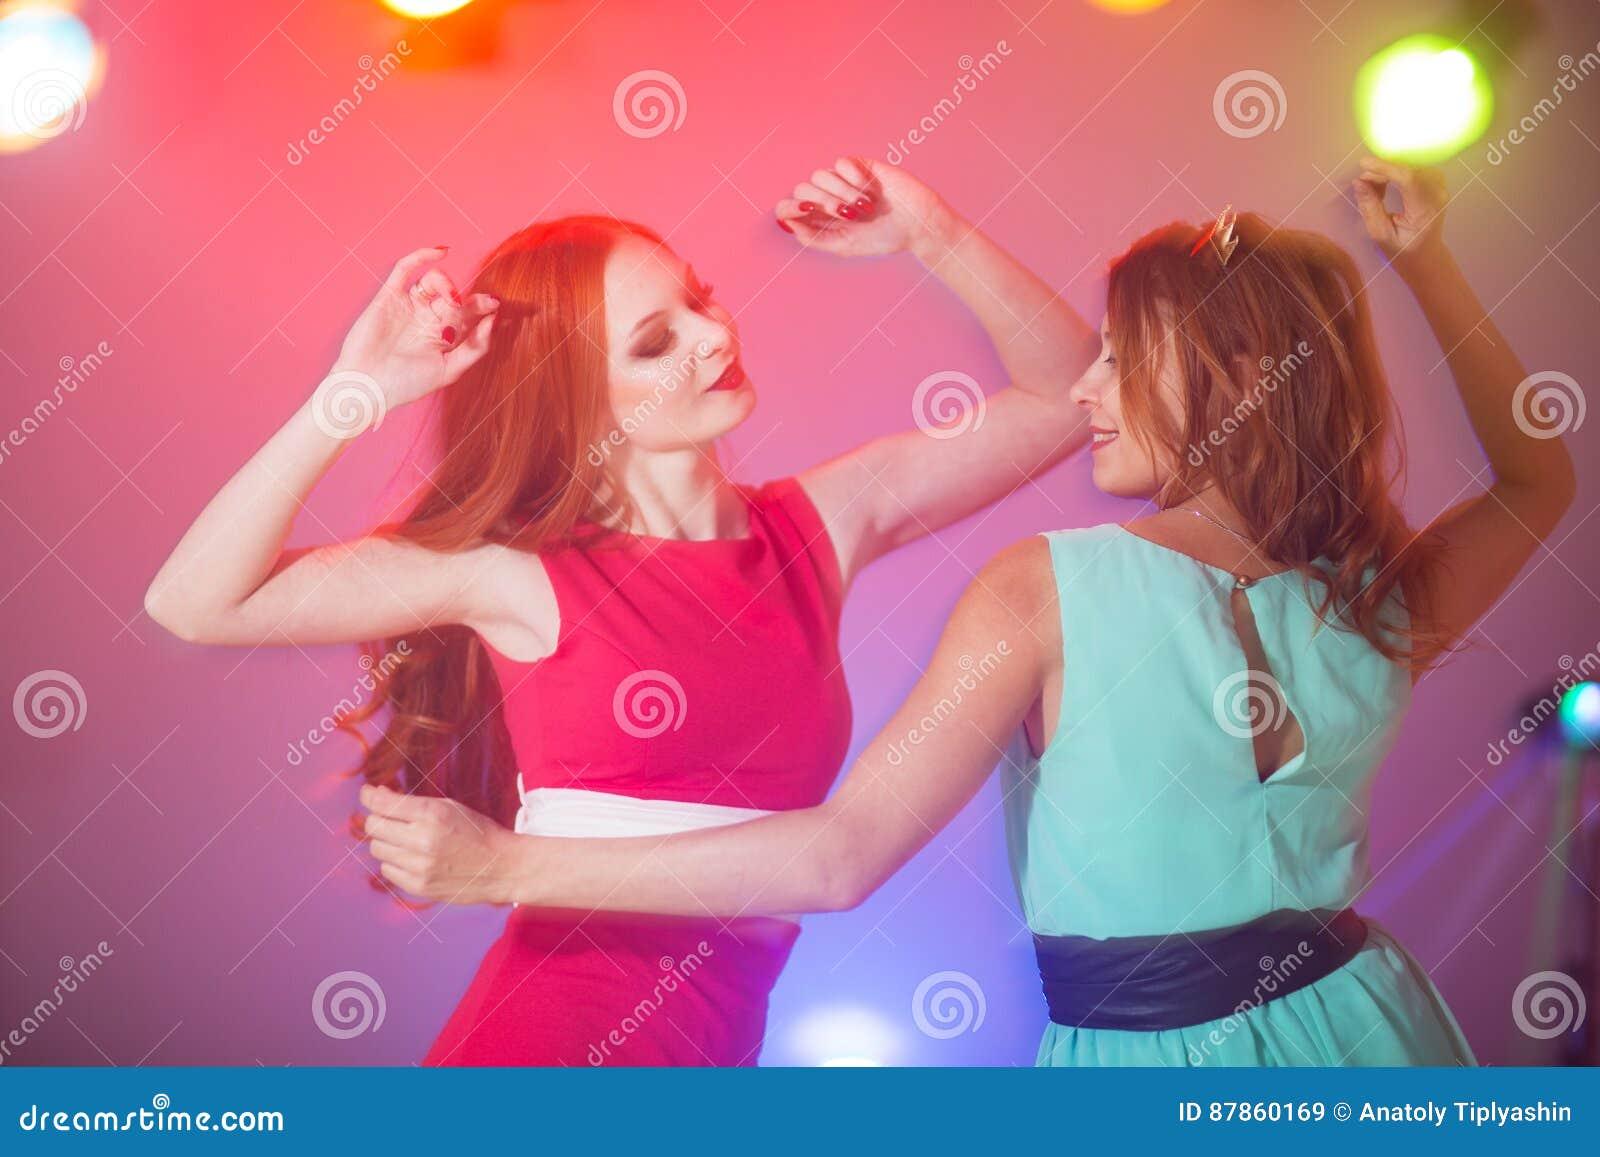 Girlfriend dance